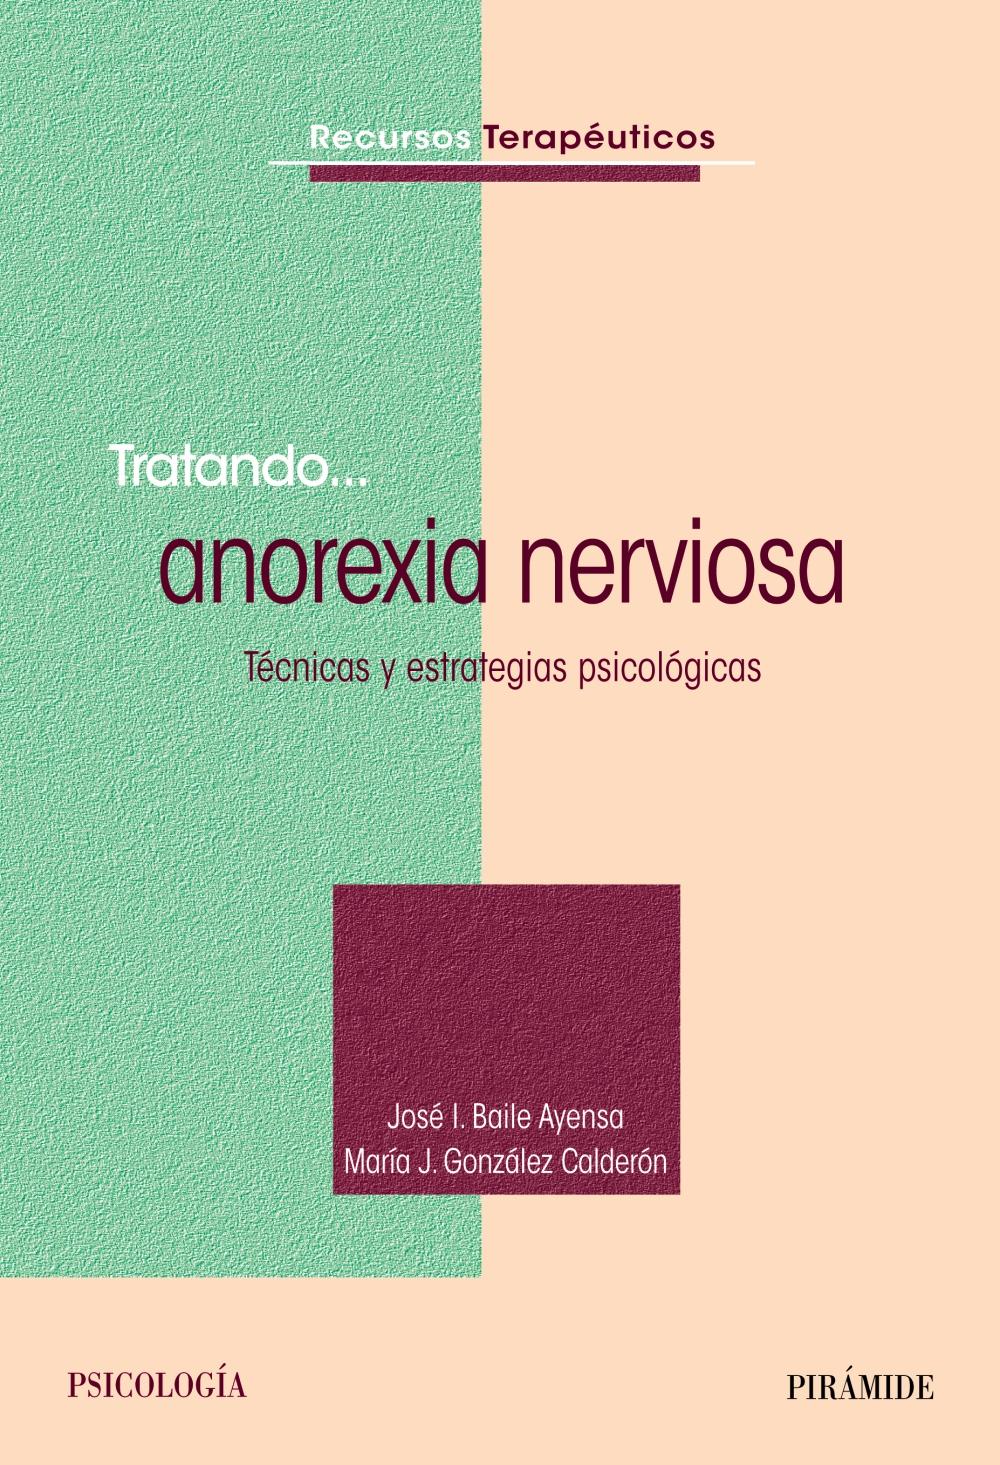 Tratando... Anorexia nerviosa (ebook)